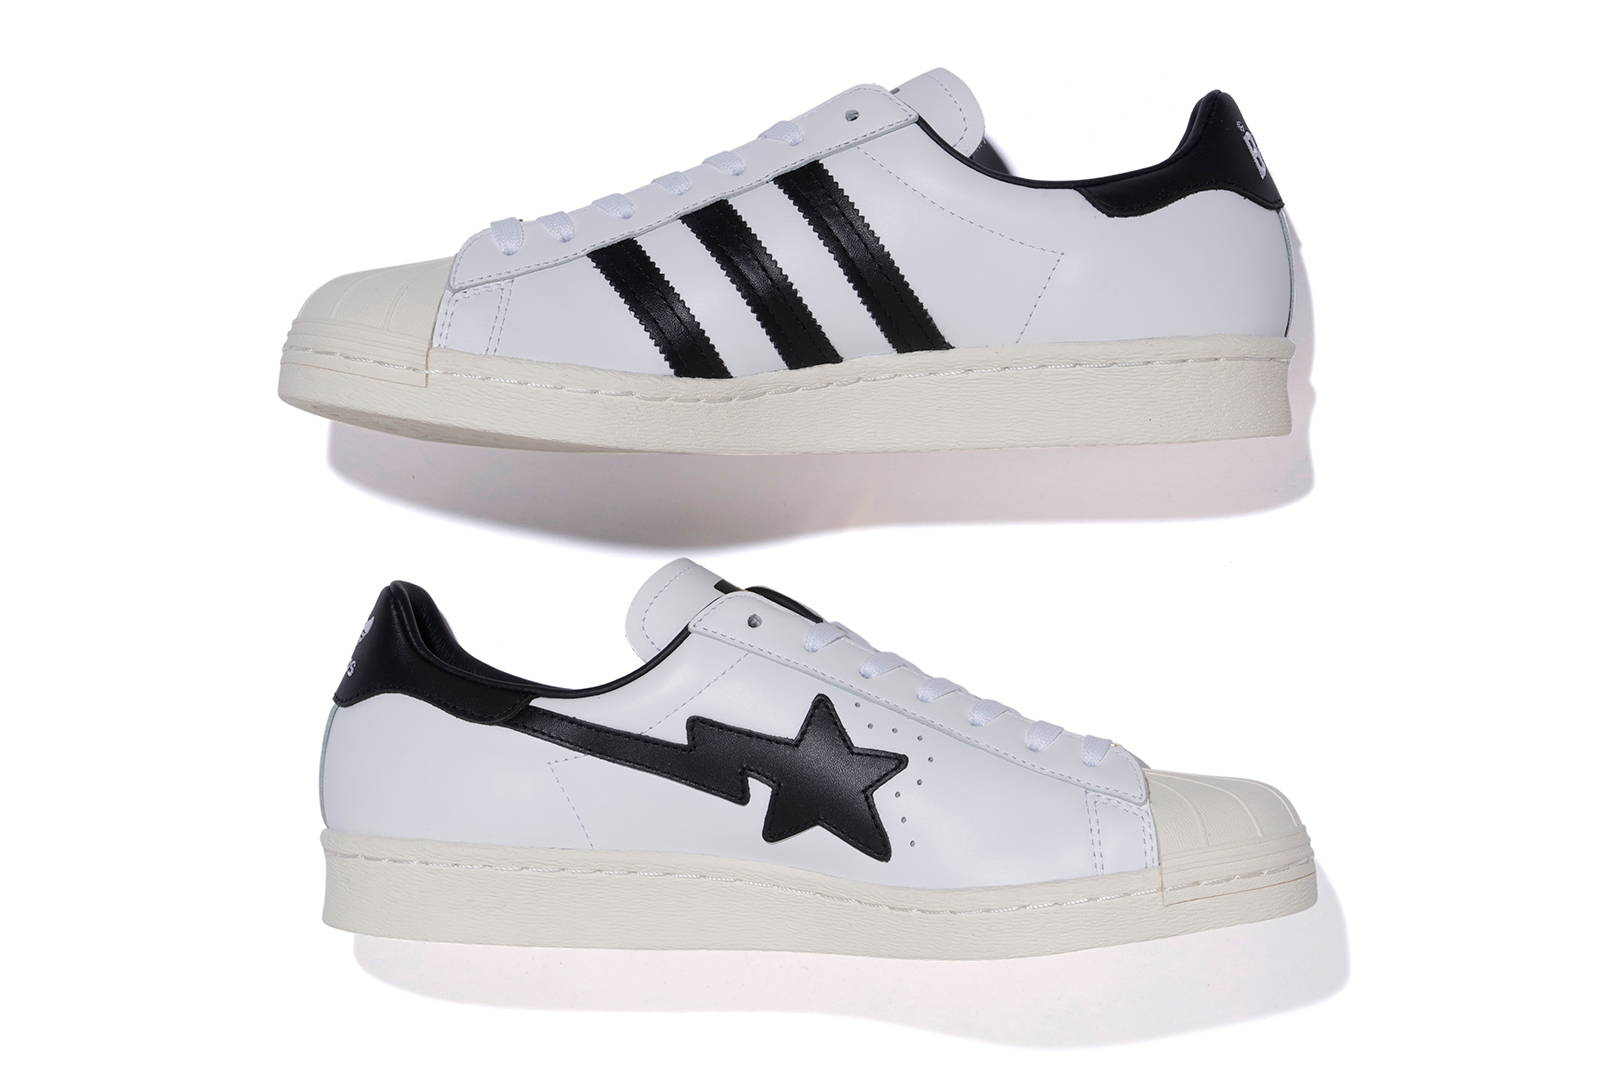 Bape x Adidas Originals Superstar Medial